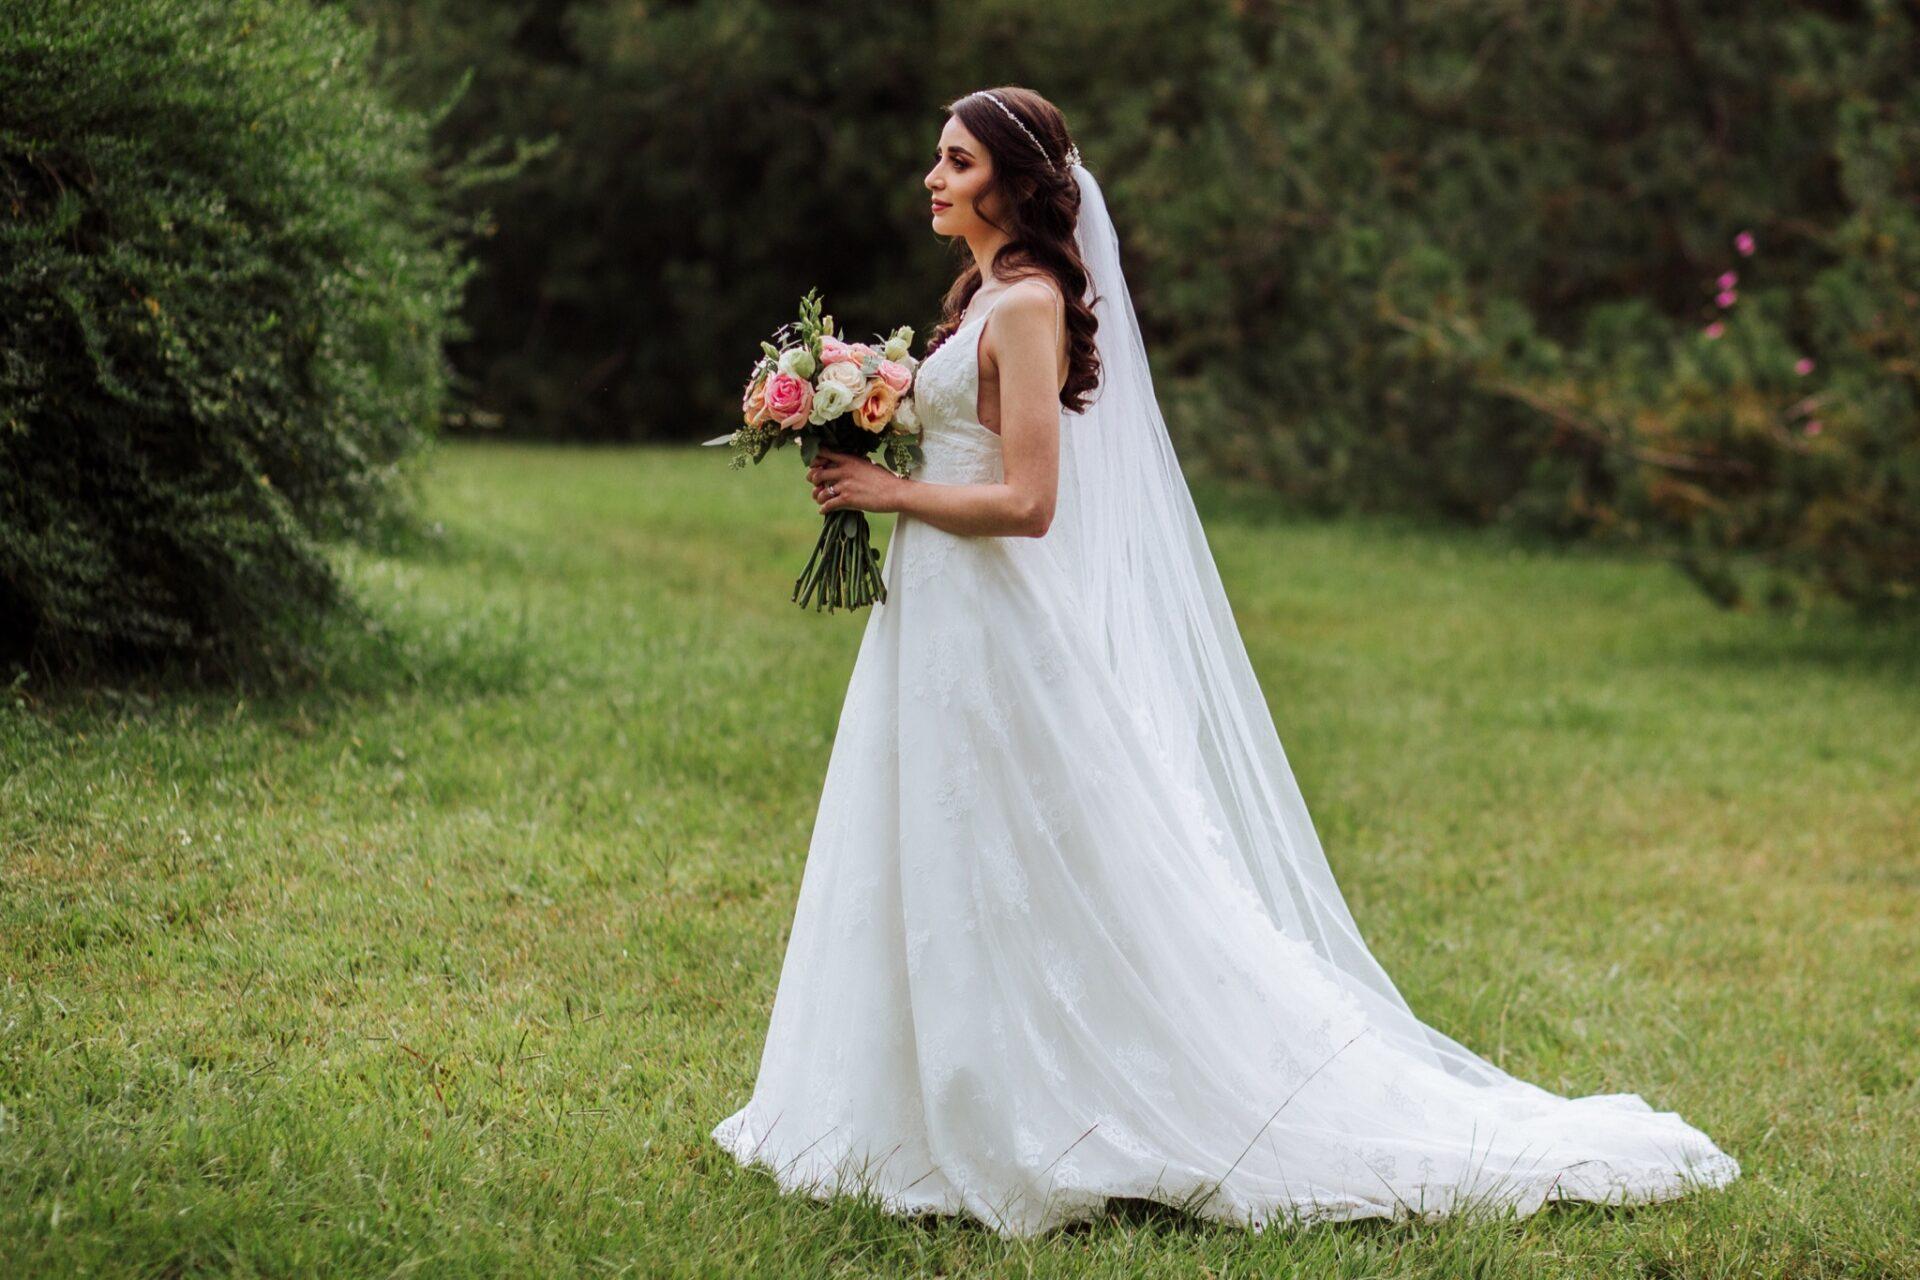 javier_noriega_fotografo_bodas_teul_zacatecas_wedding_photographer24a